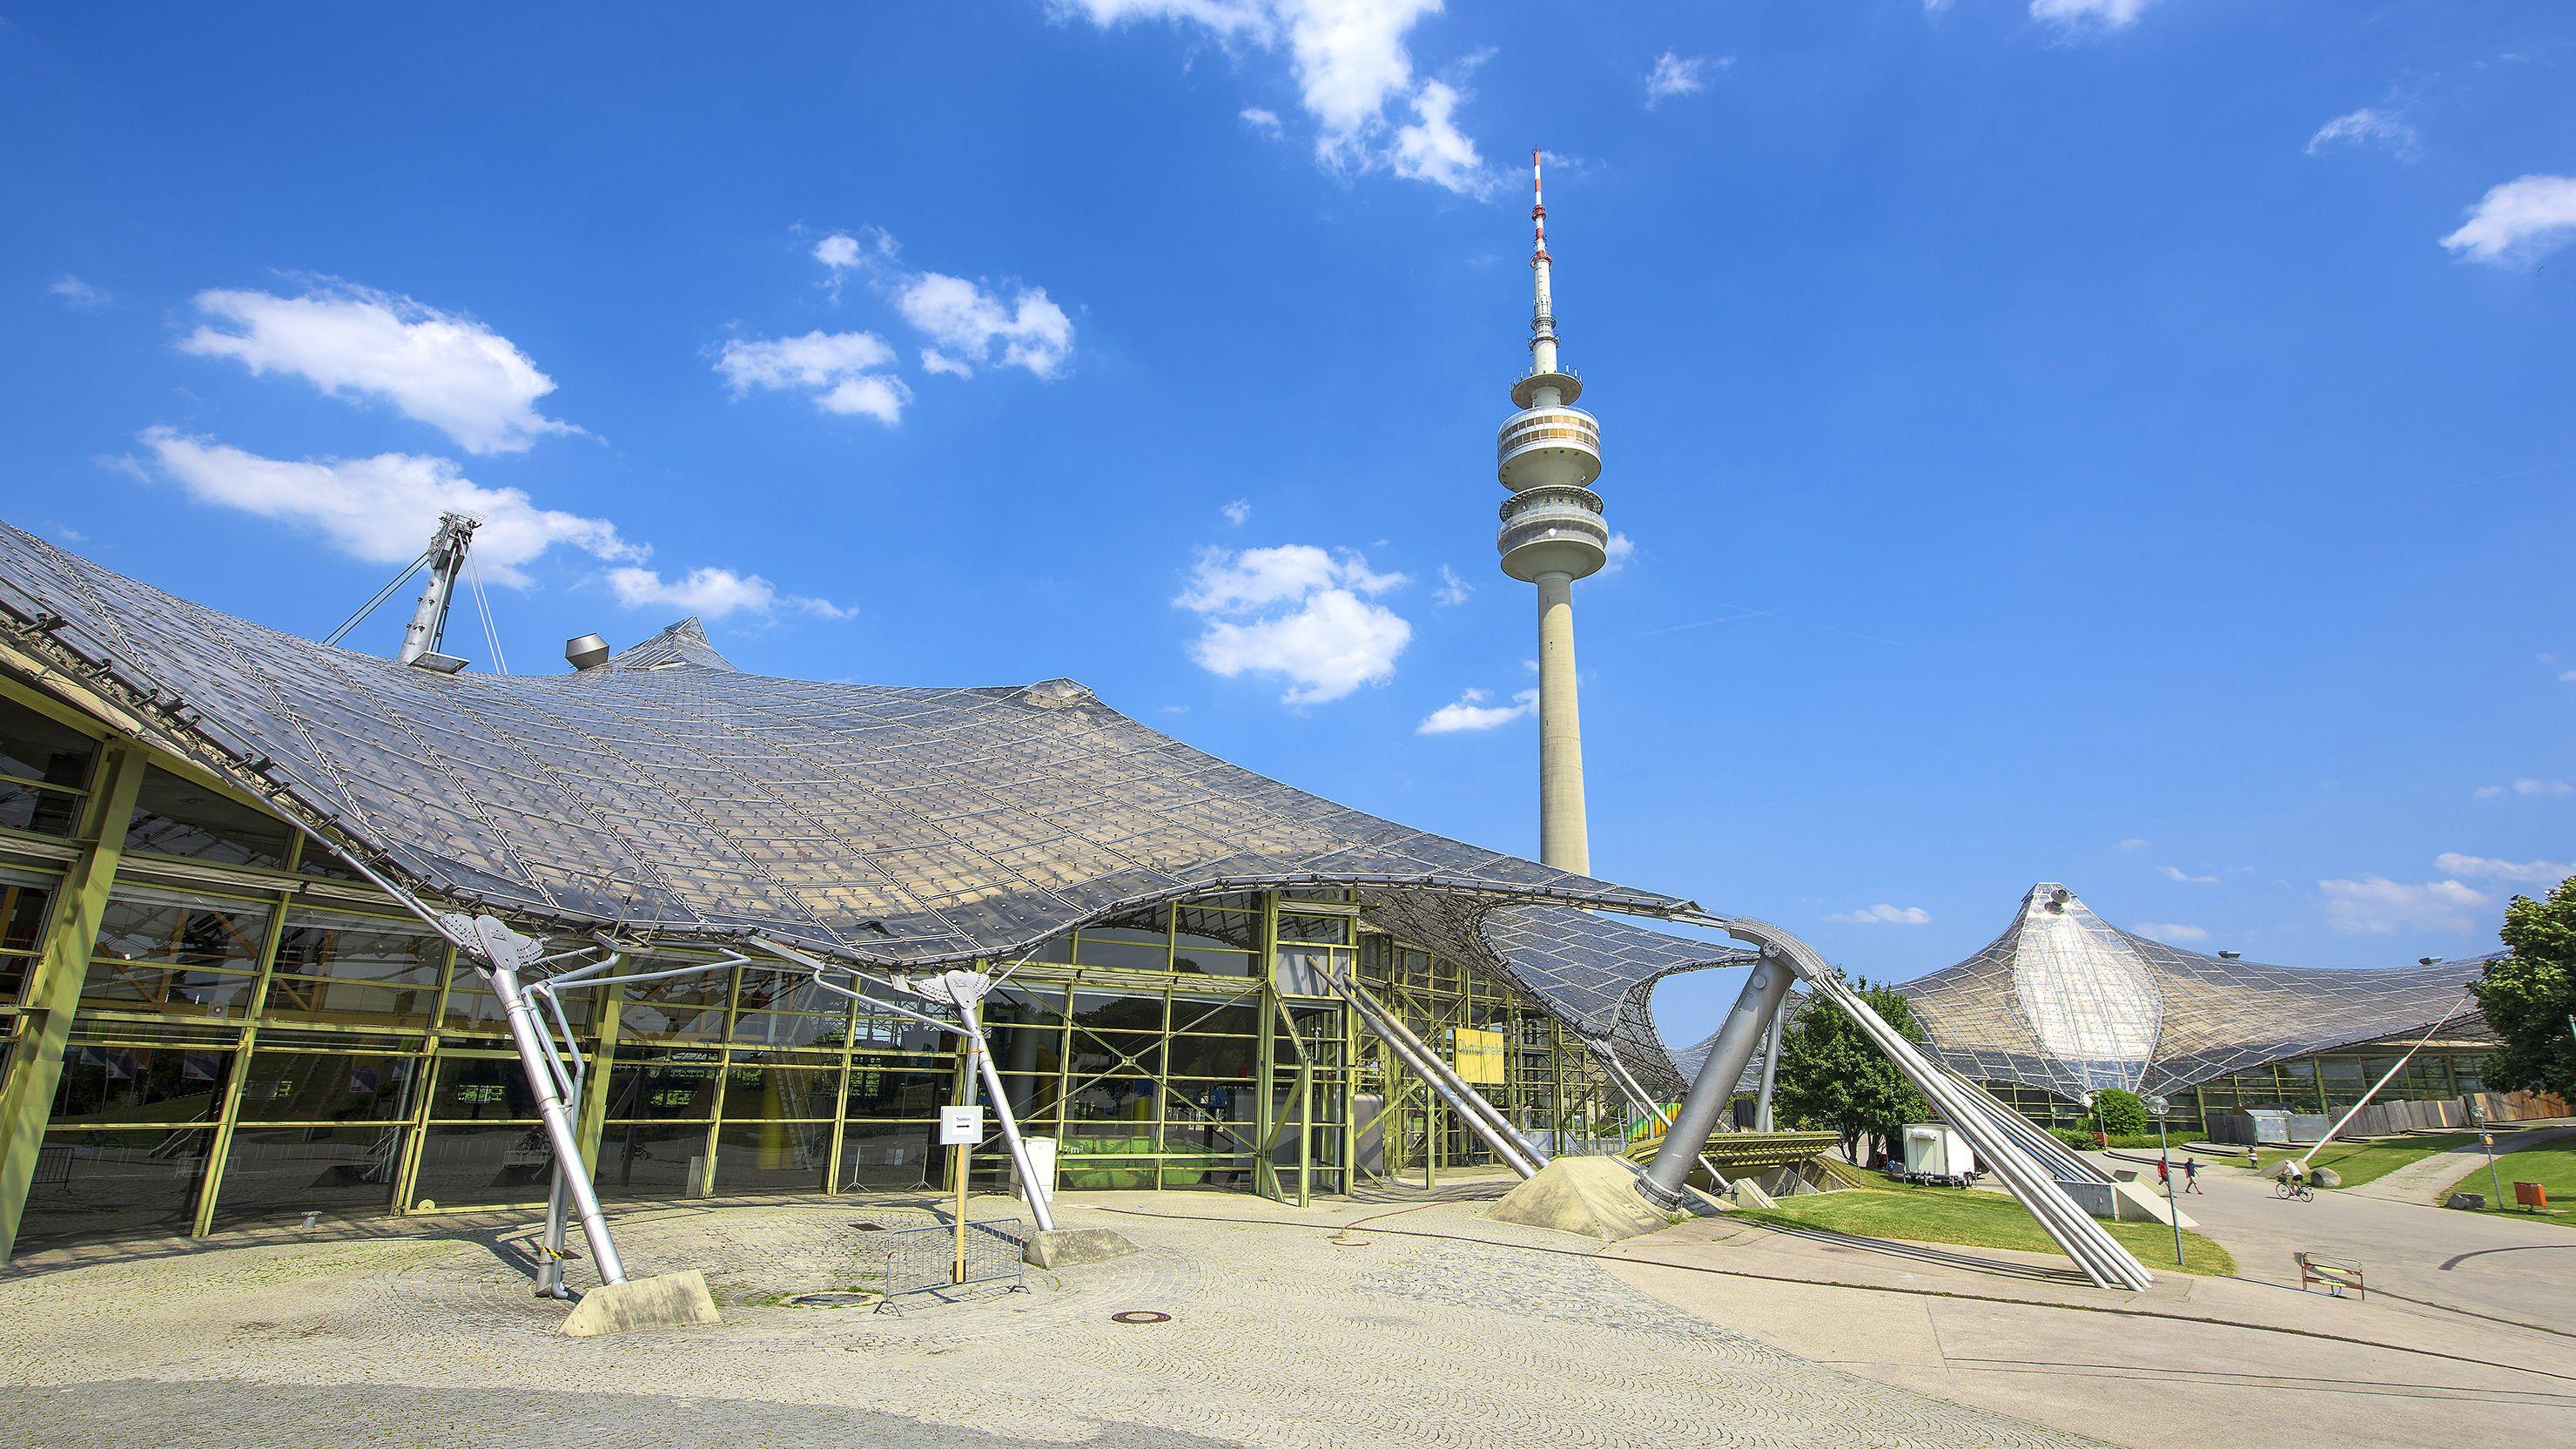 Olympiahalle und Olympiaturm